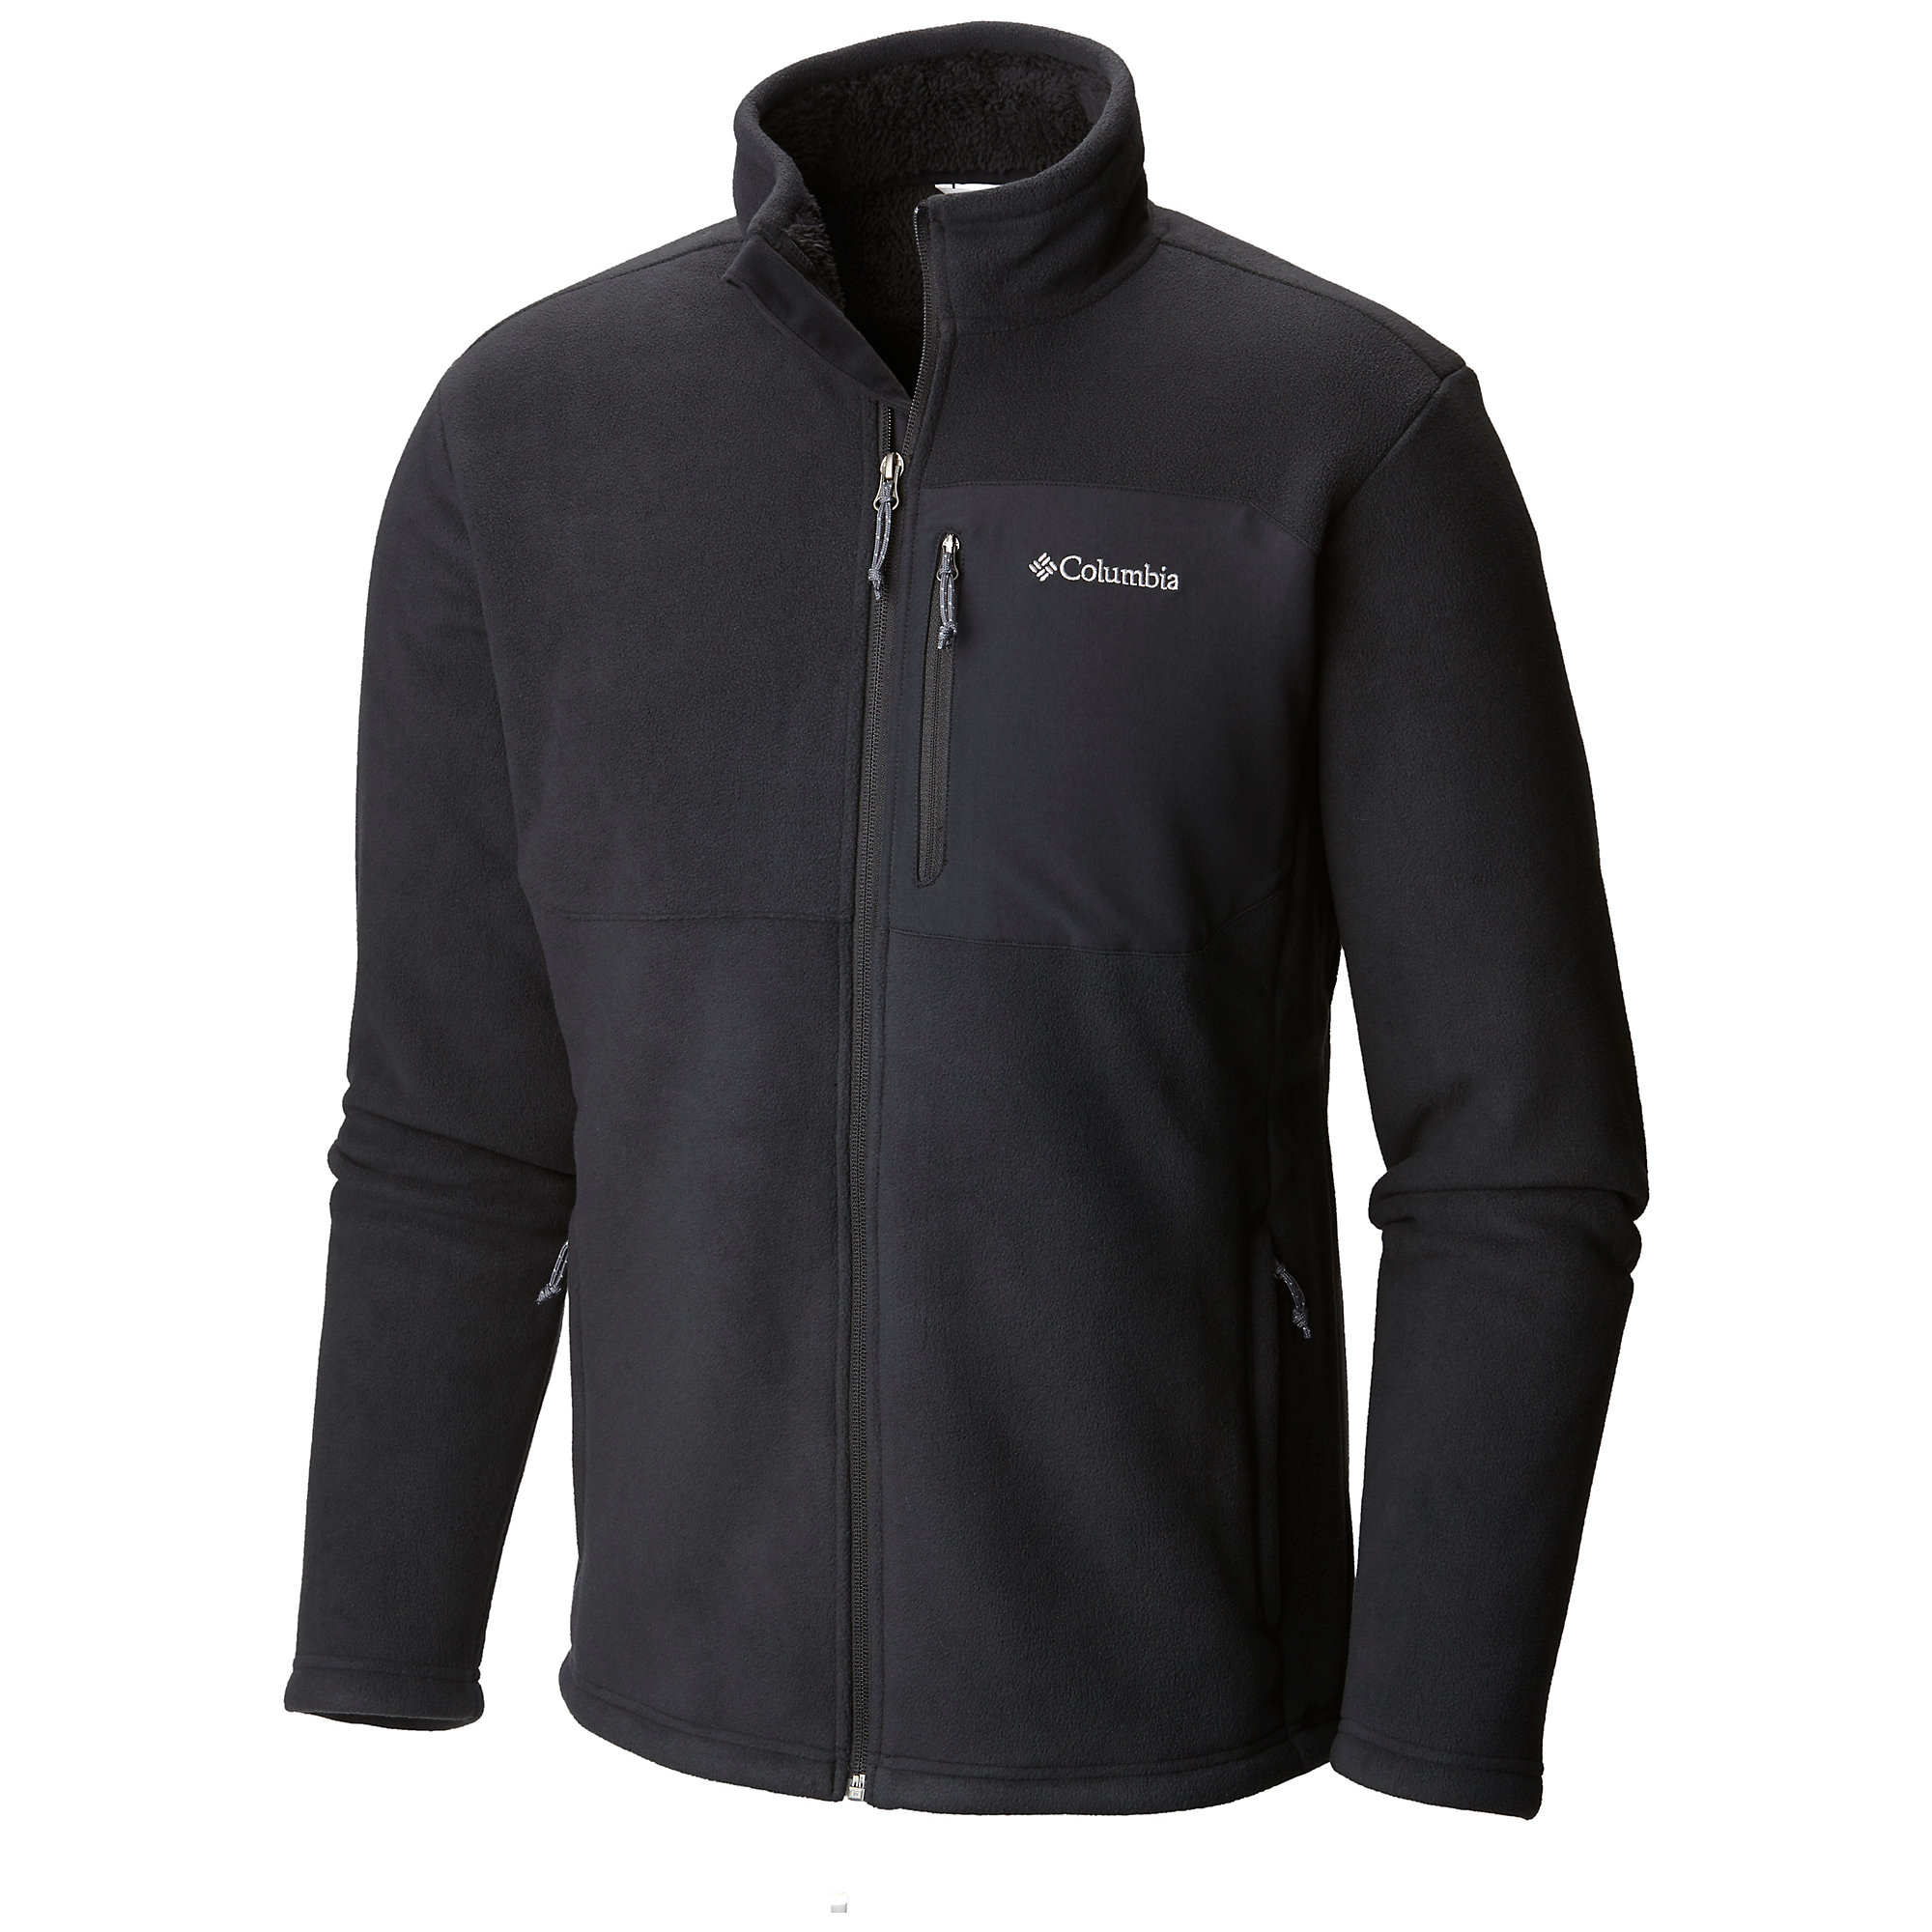 Columbia Teton Peak Fleece Jacket